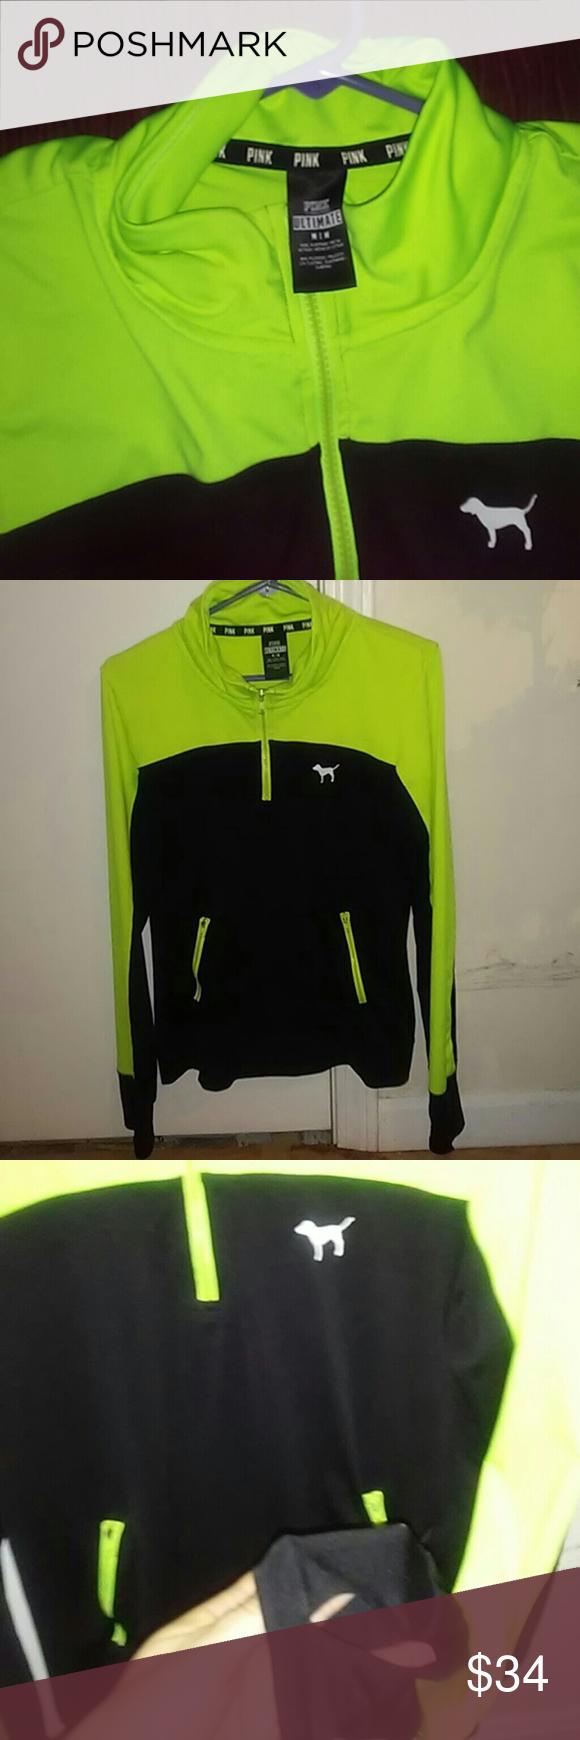 06c3e20fbcbb1 Vs/pink ultimate track jacket Neon yellow & black half zip ultimate track  jacket.. Thumb holes & 2 zip pockets PINK Victoria's Secret Tops Sweatshirts  & ...